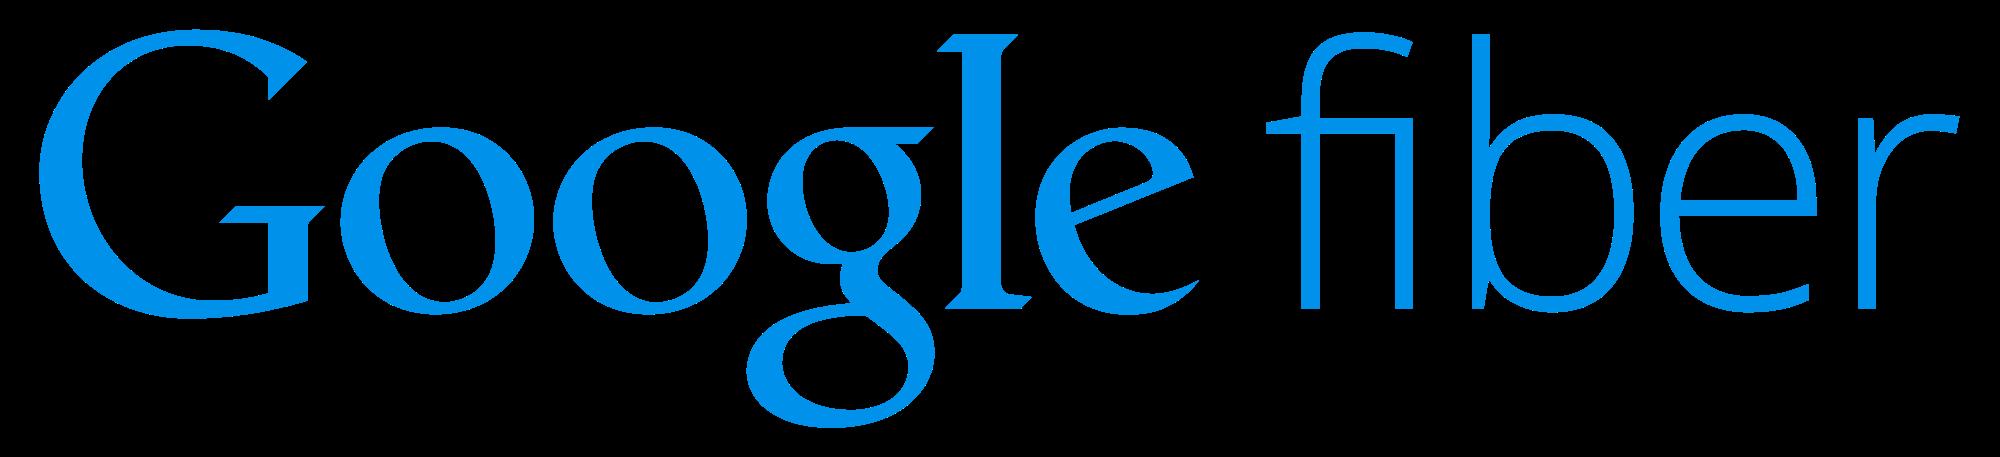 Google_Fiber_logo.png